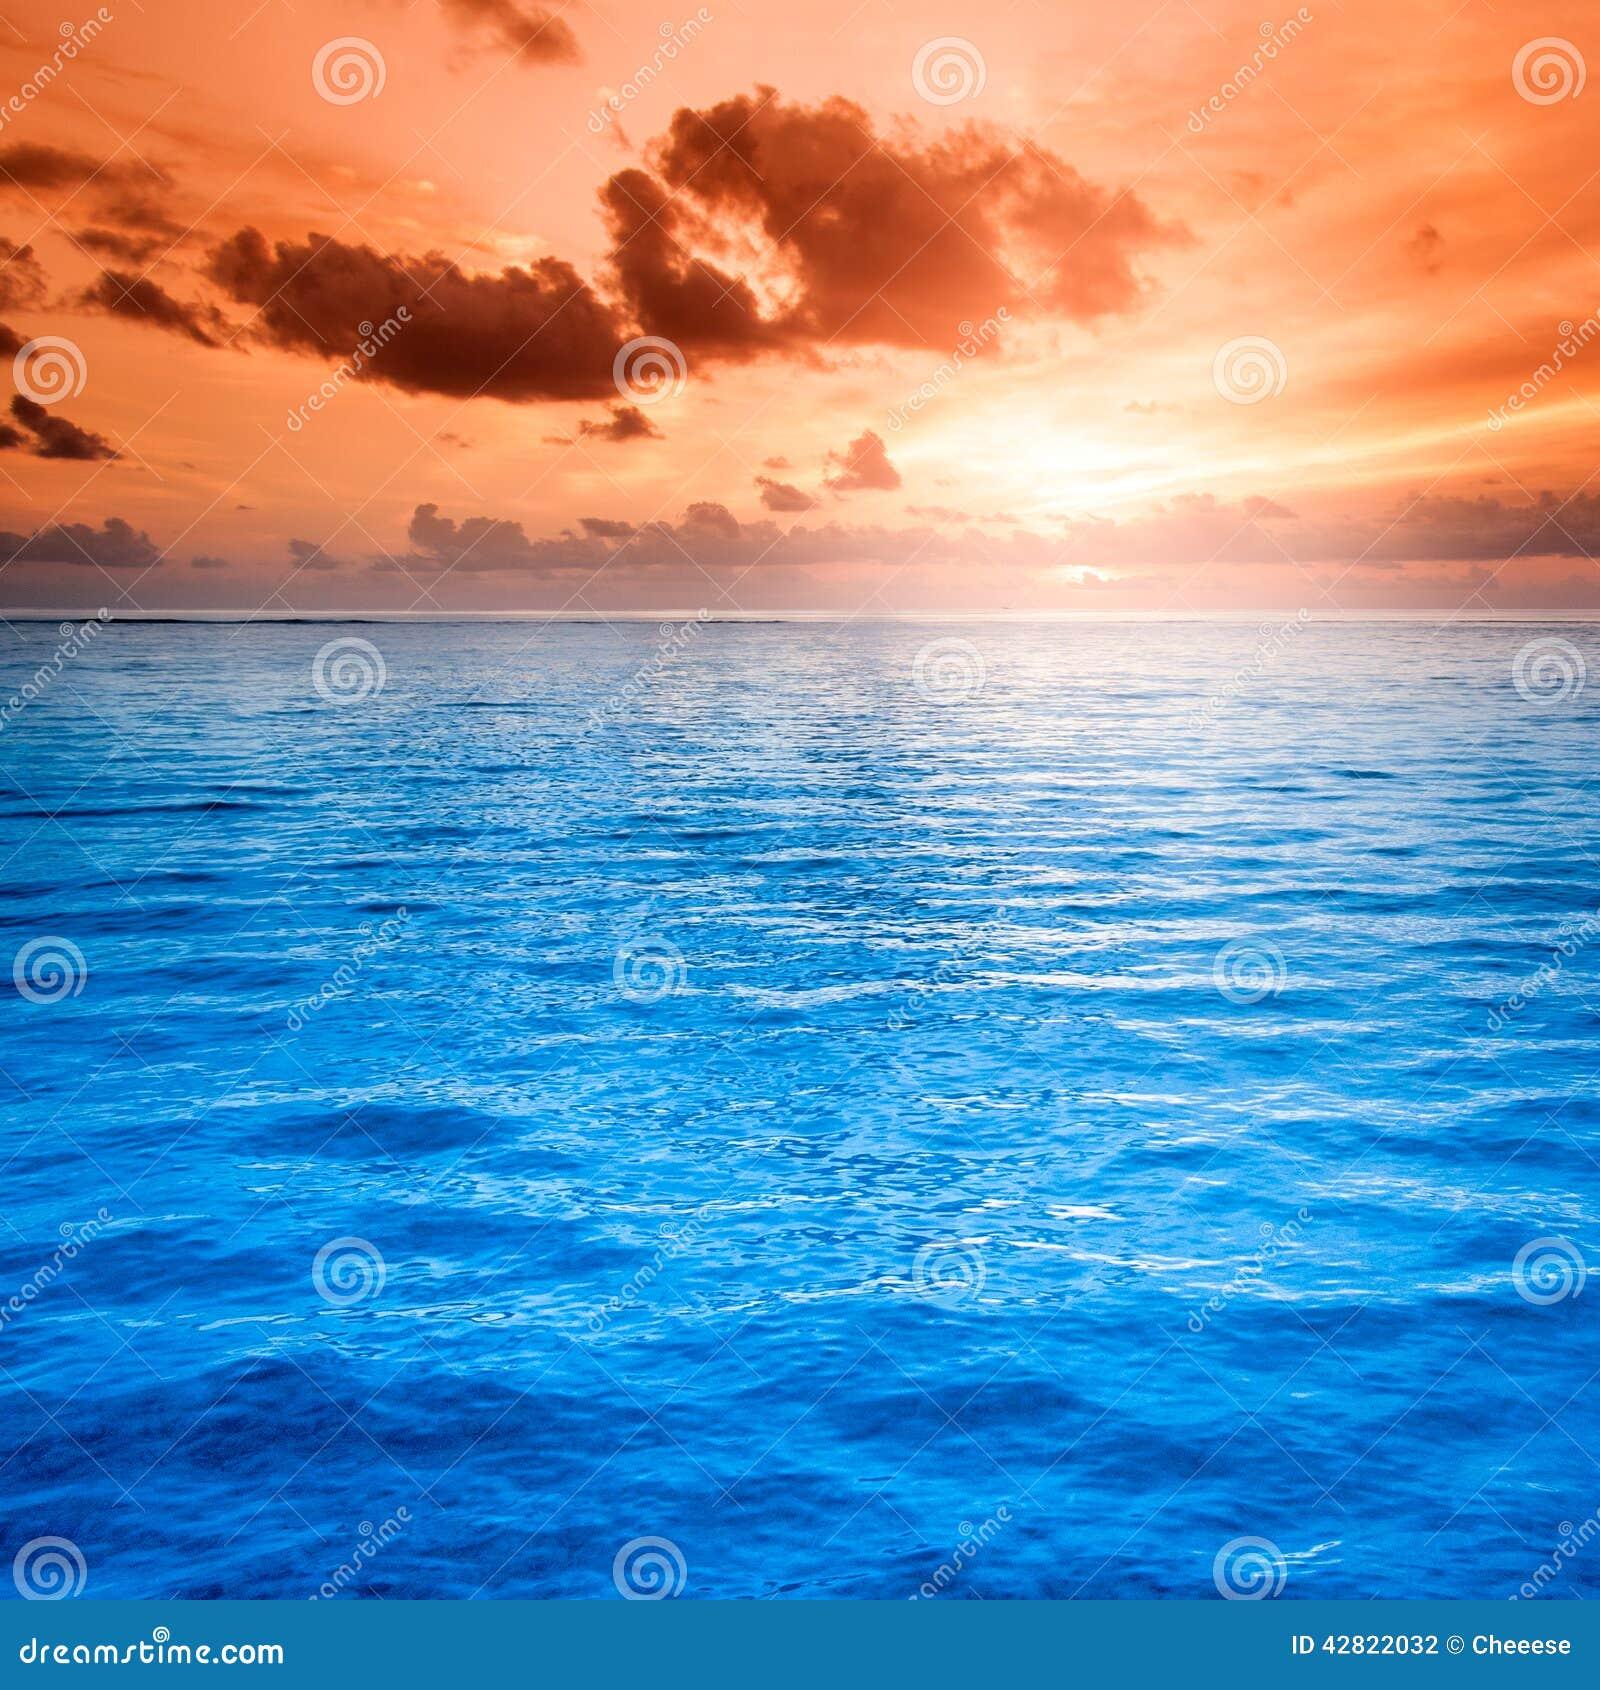 ocean and beach sunset scene stock photos image 29230423